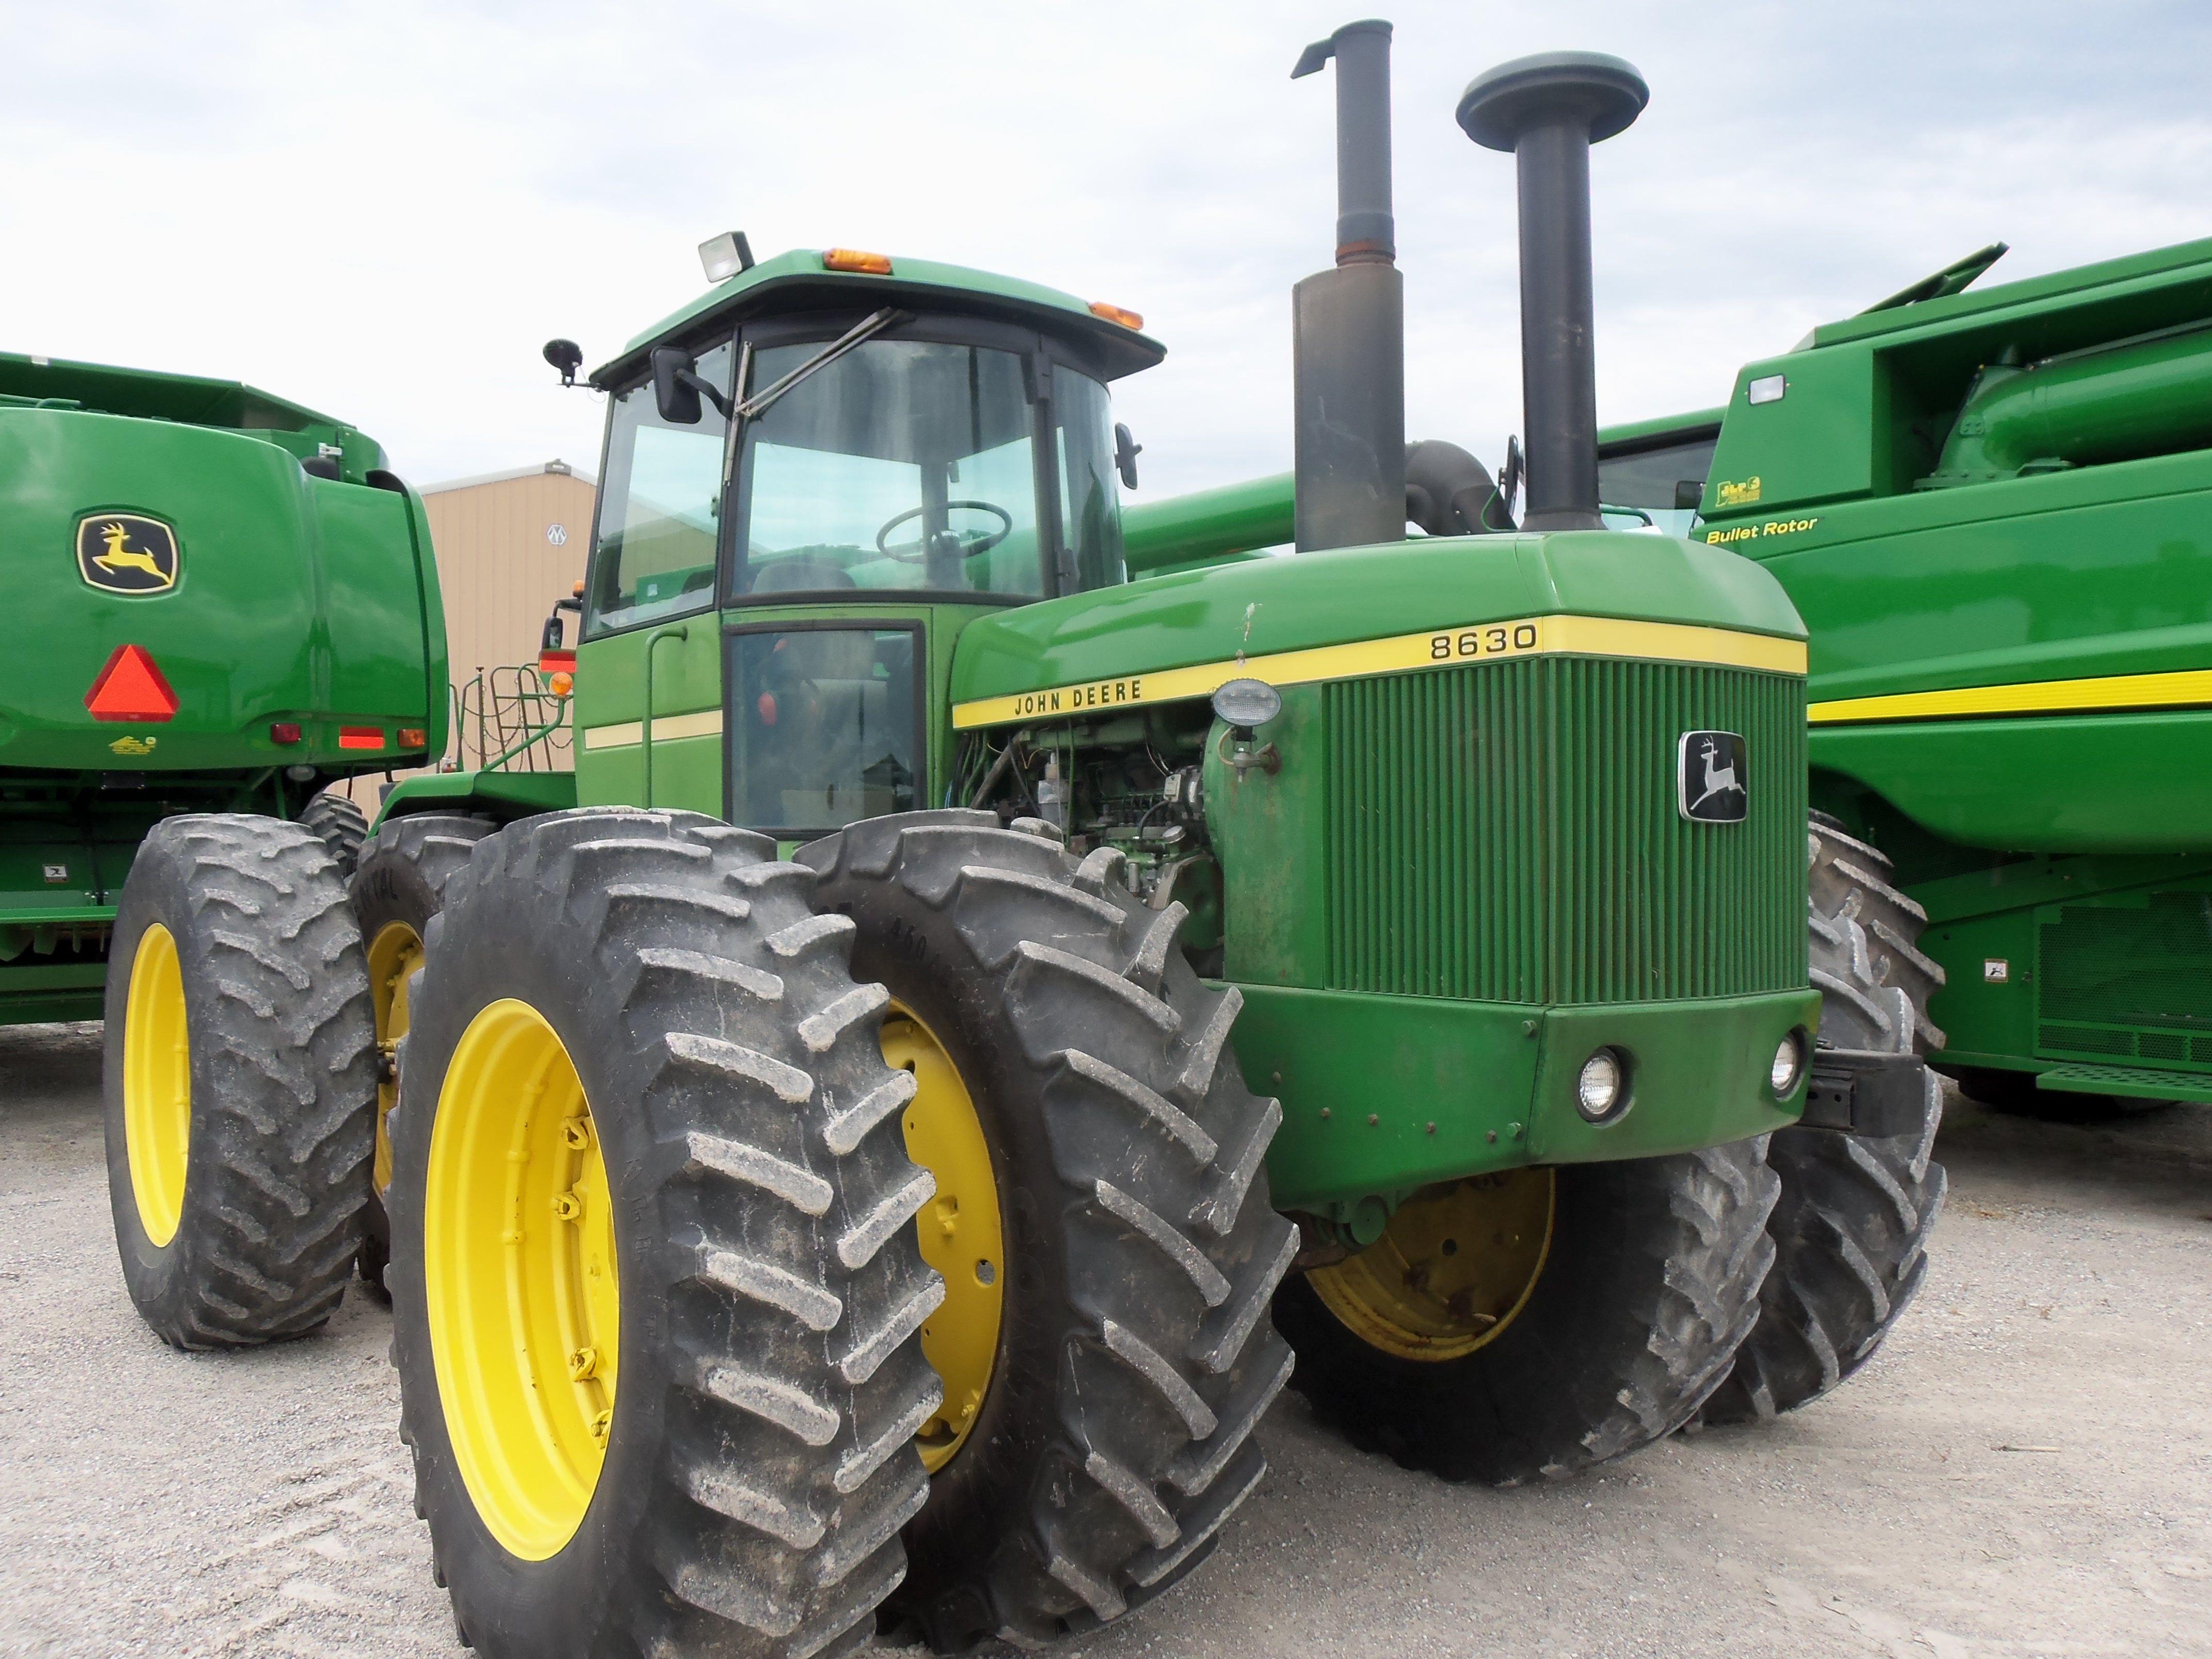 275hp 8630 | John Deere equipment | Pinterest